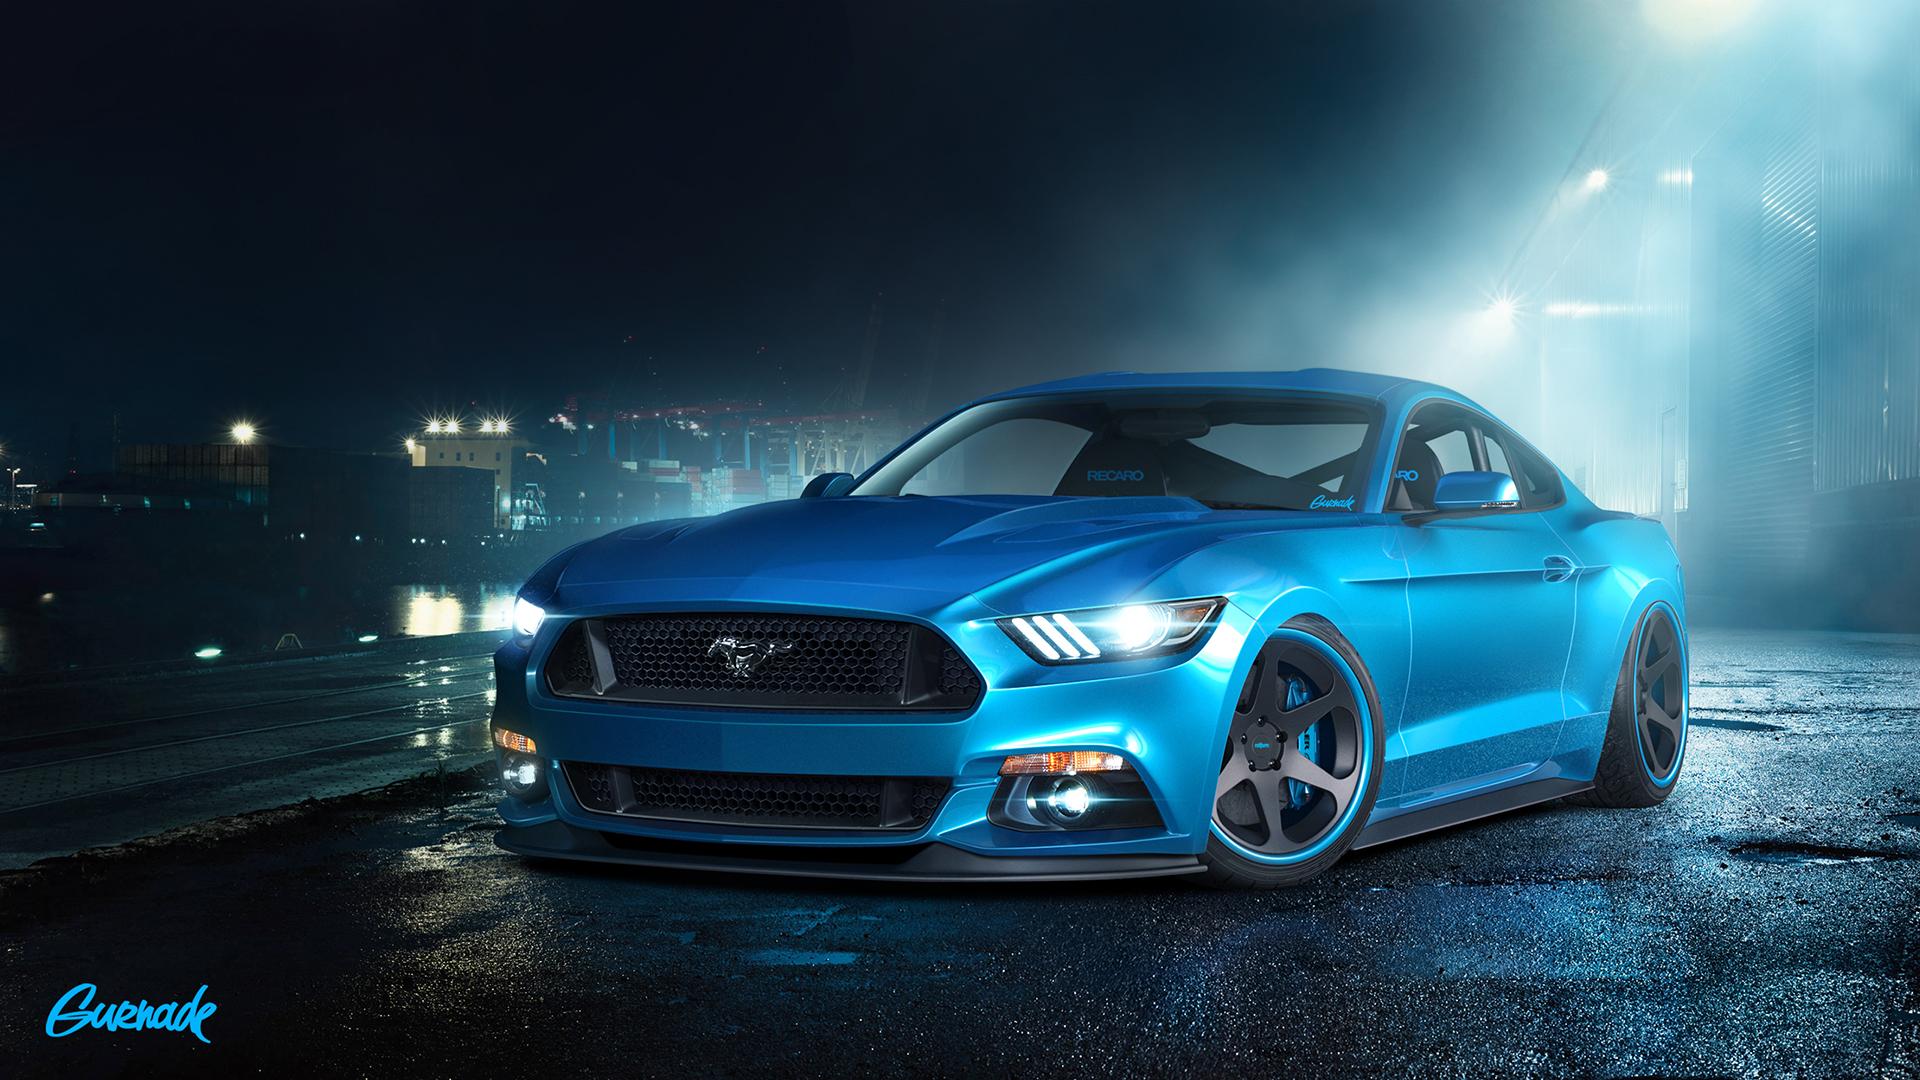 Free Download 2015 Ford Mustang Gt Wallpaper Hd Car